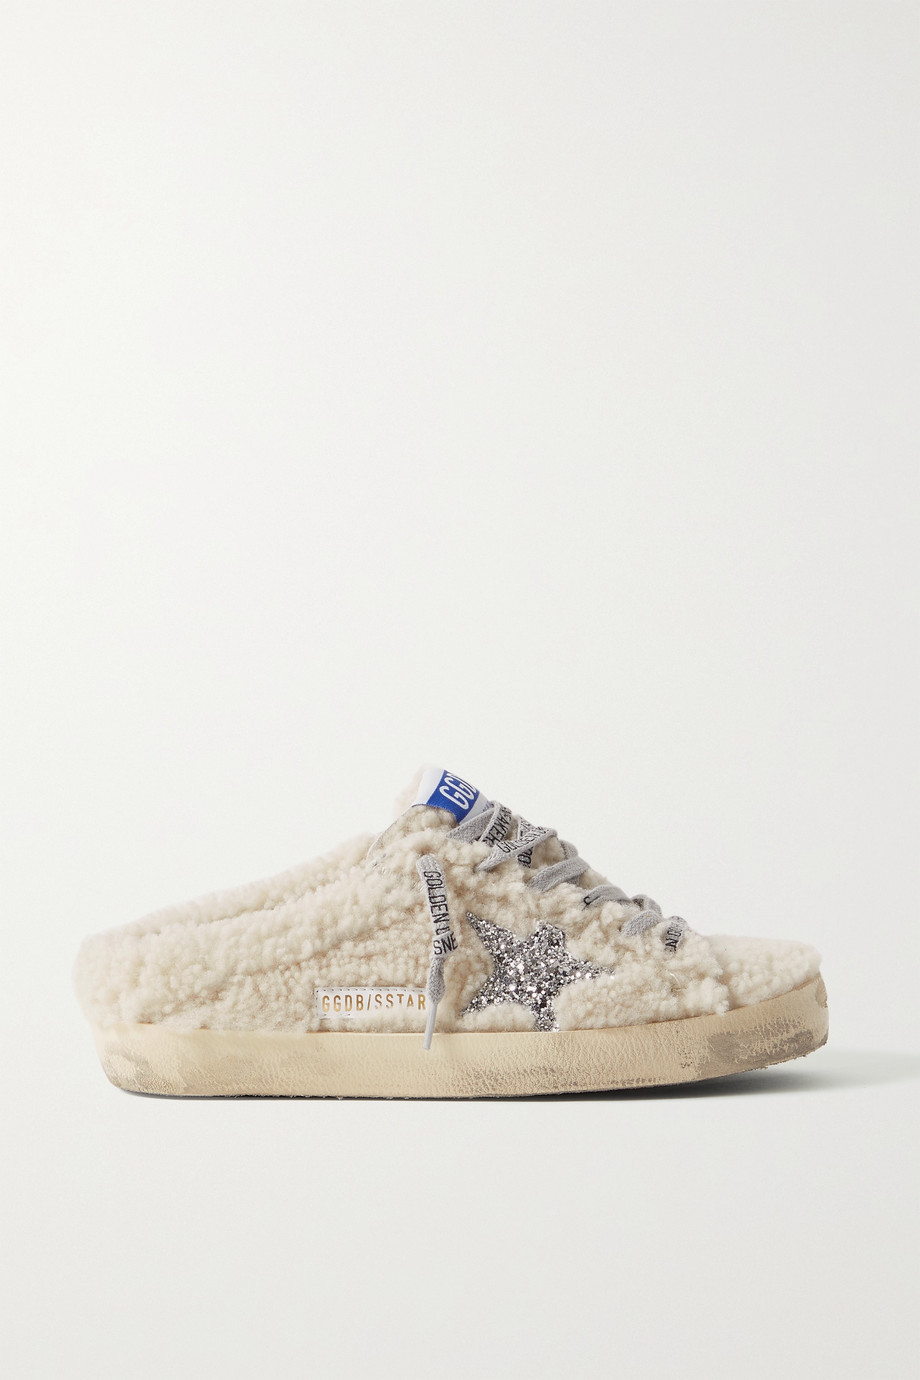 Golden Goose Superstar Sabot distressed glittered shearling slip-on sneakers